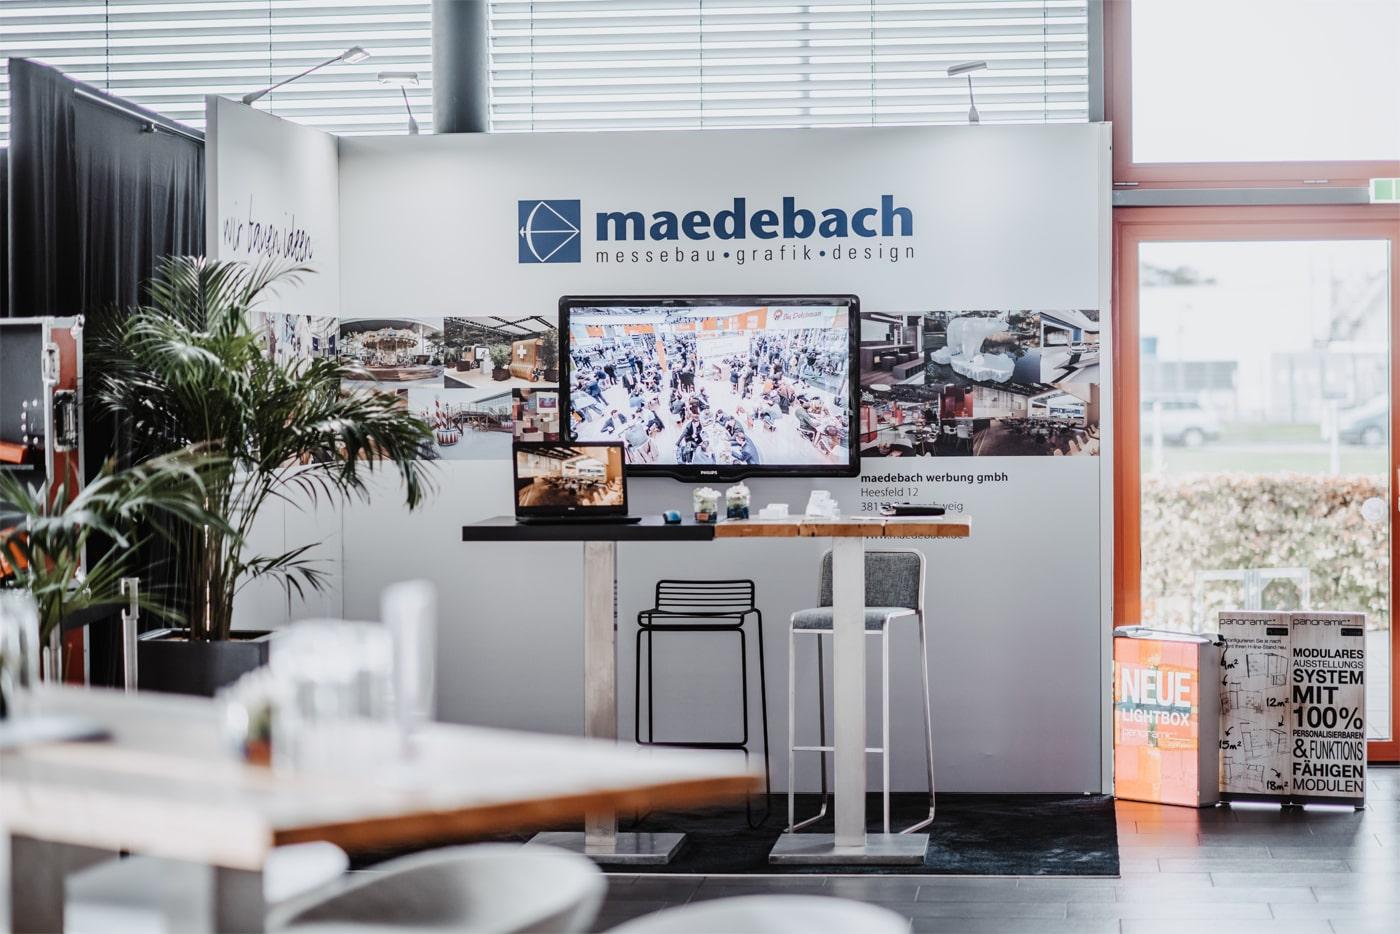 Eventplanung Masterclass   Eventbau   Maedebach Braunschweig  